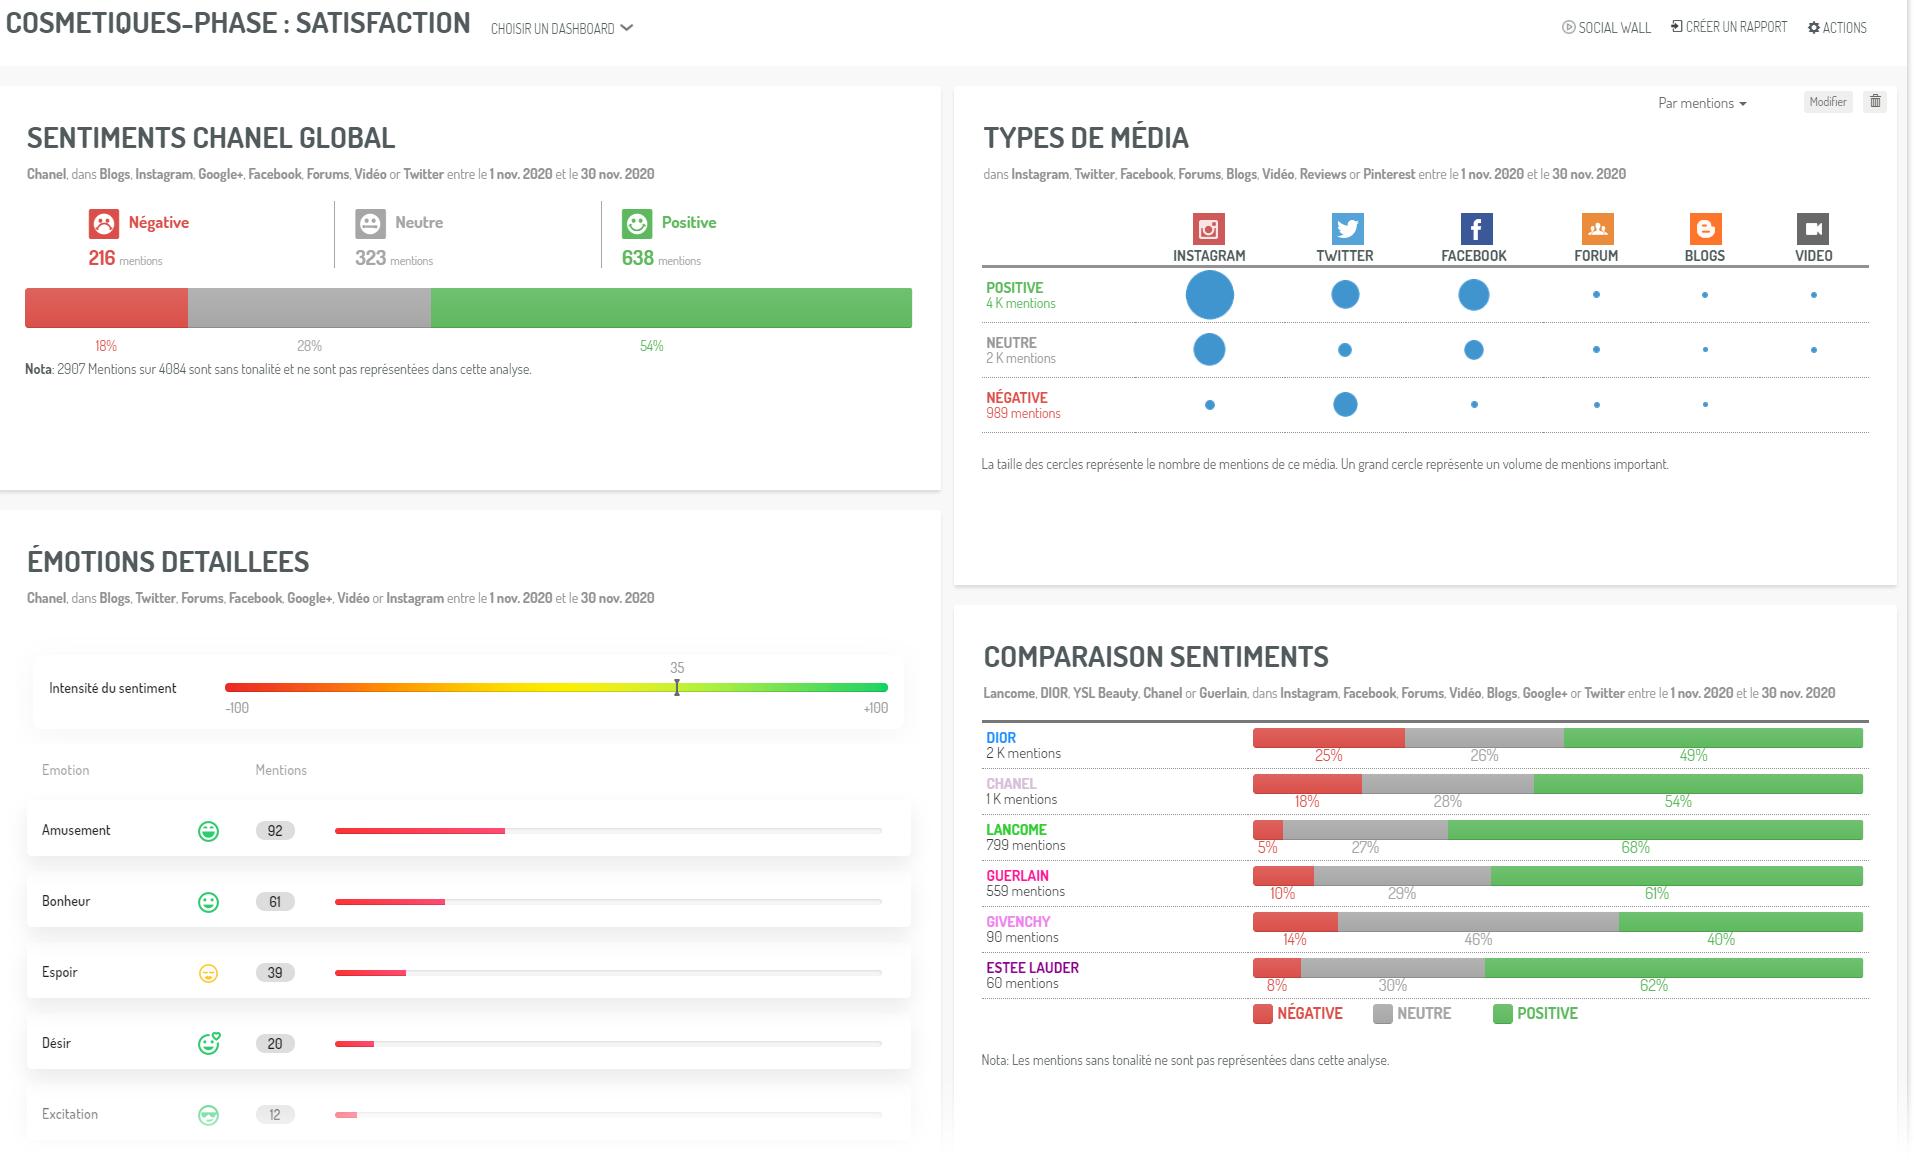 Un dashboard organisé selon les phases du tunne marketing. Ici, la satisfaction